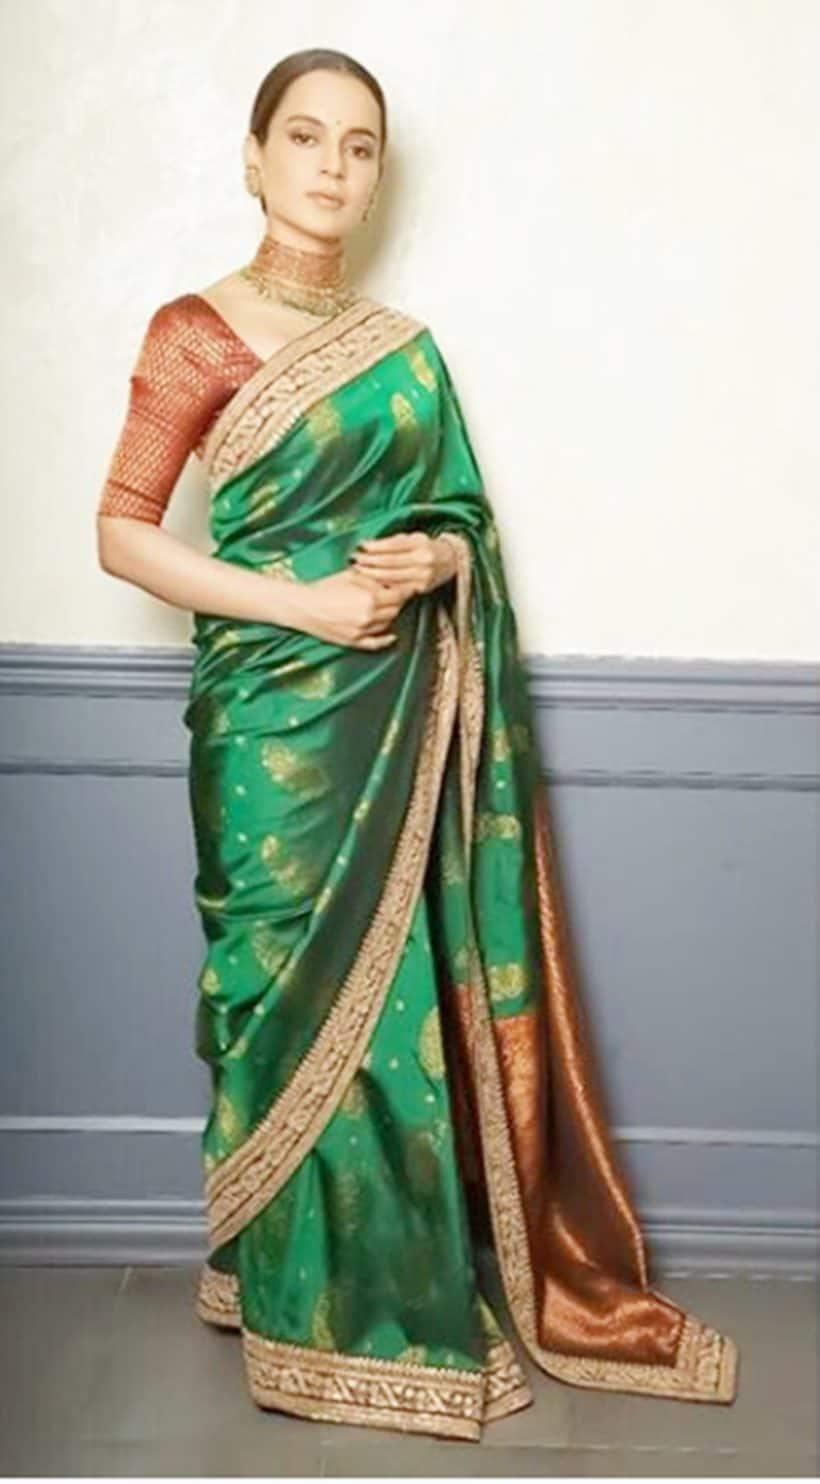 fashion hits and misses, aishwarya rai bachchan, deepika padukone, anushka sharma, priyanka chopra, kareena kapoor khan, sonam kapoor, alia bhatt, kangana ranaut, manushi chhillar, sridevi, aditi rao hydari, shilpa shetty, taapsee pannu, aditi rao hydari, madhuri dixit, kajol, raveena tandon, celeb fashion, bollywood fashion, indian express, indian express news